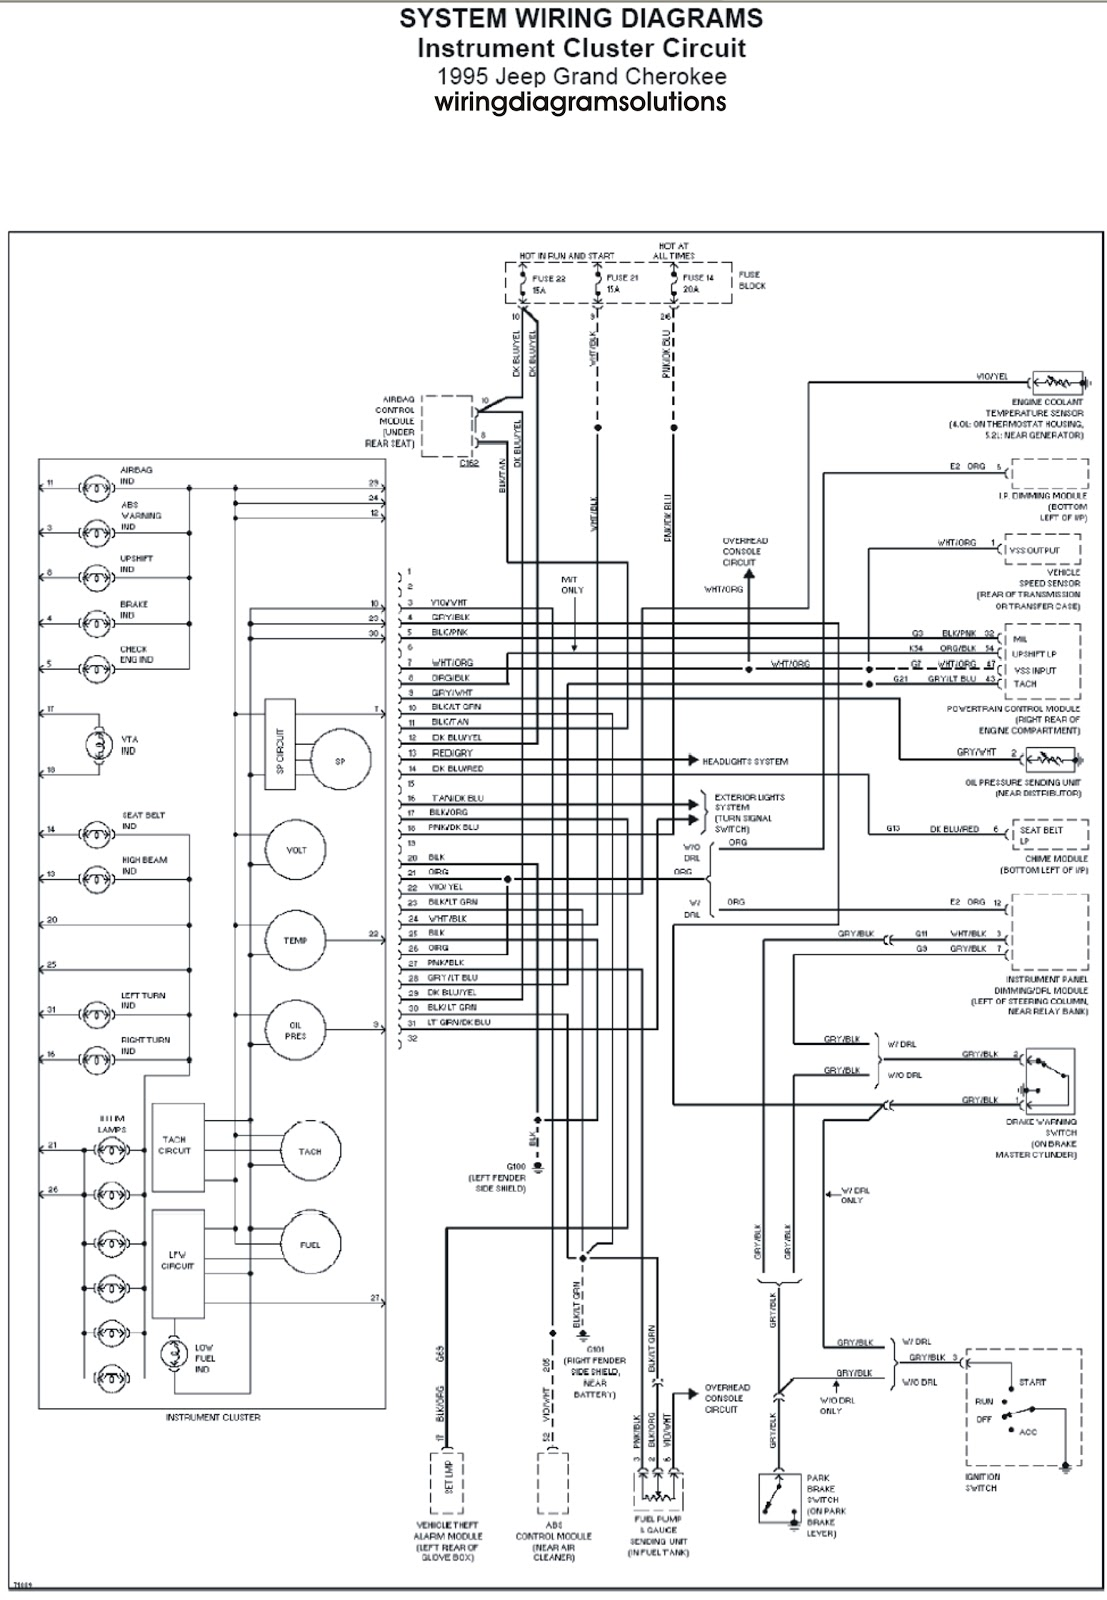 2003 Mercury Grand Marquis Wiring Diagrams Library 2000 Radio Diagram 95 Trusted Slammed 1992